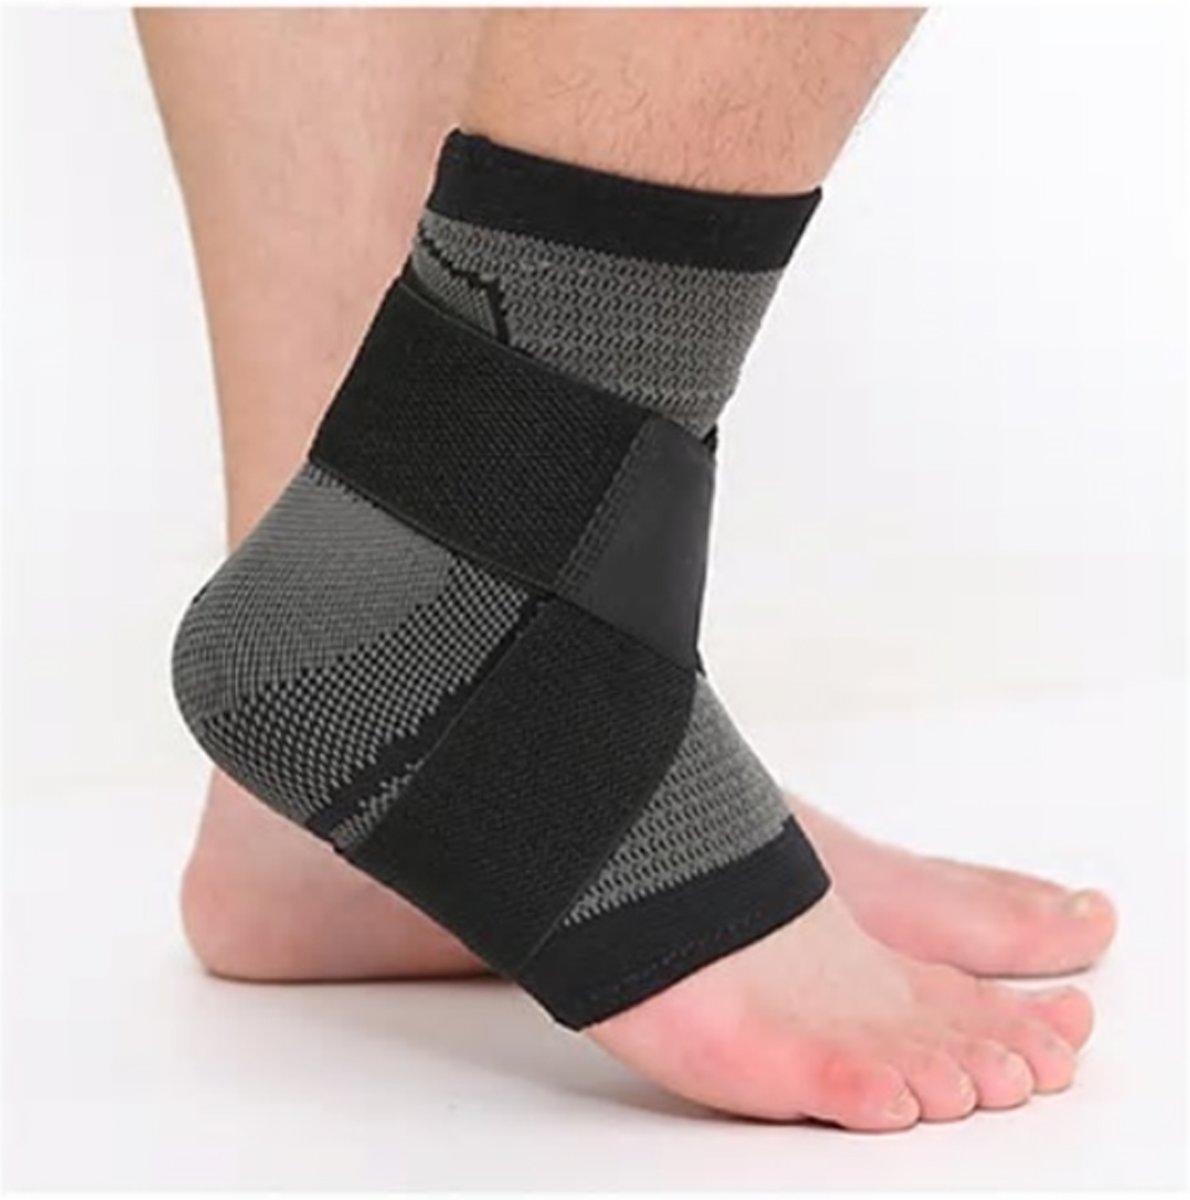 Enkelbrace Enkelbandage Band - Straps - Ortho Stretch Compressie - Enkelsleeve - Medium tot Max Enkel bescherming en ondersteuning - Lichtgewicht Zwart - Maat M